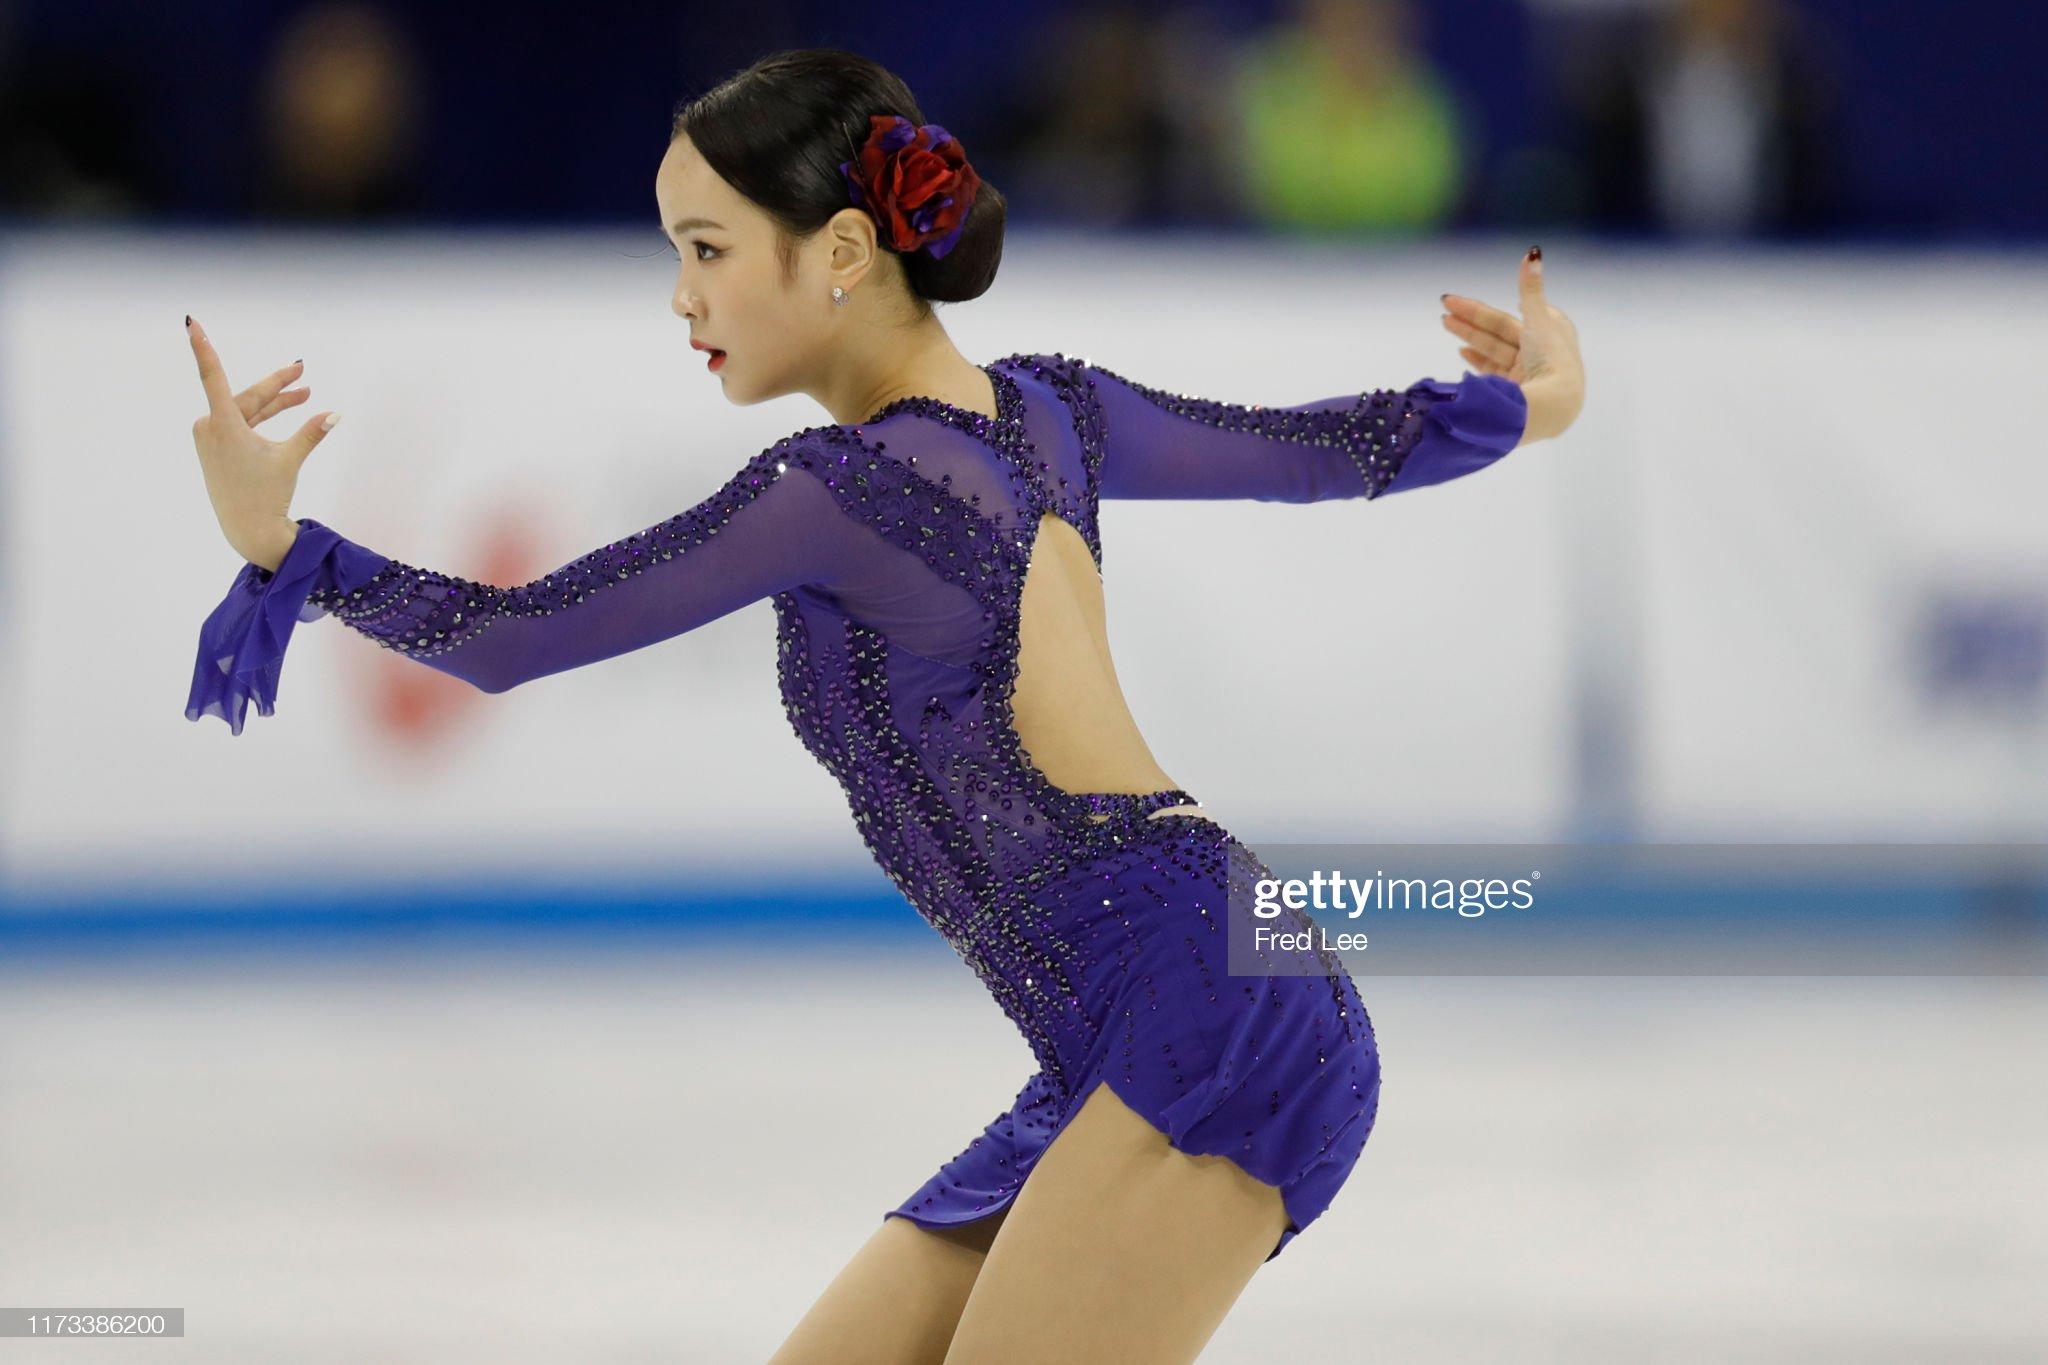 Shanghai Trophy (Invitational). 3-5 октября 2019. Шанхай (Китай) - Страница 3 Eunsoo-lim-of-korea-competes-in-the-ladies-short-program-during-the-picture-id1173386200?s=2048x2048